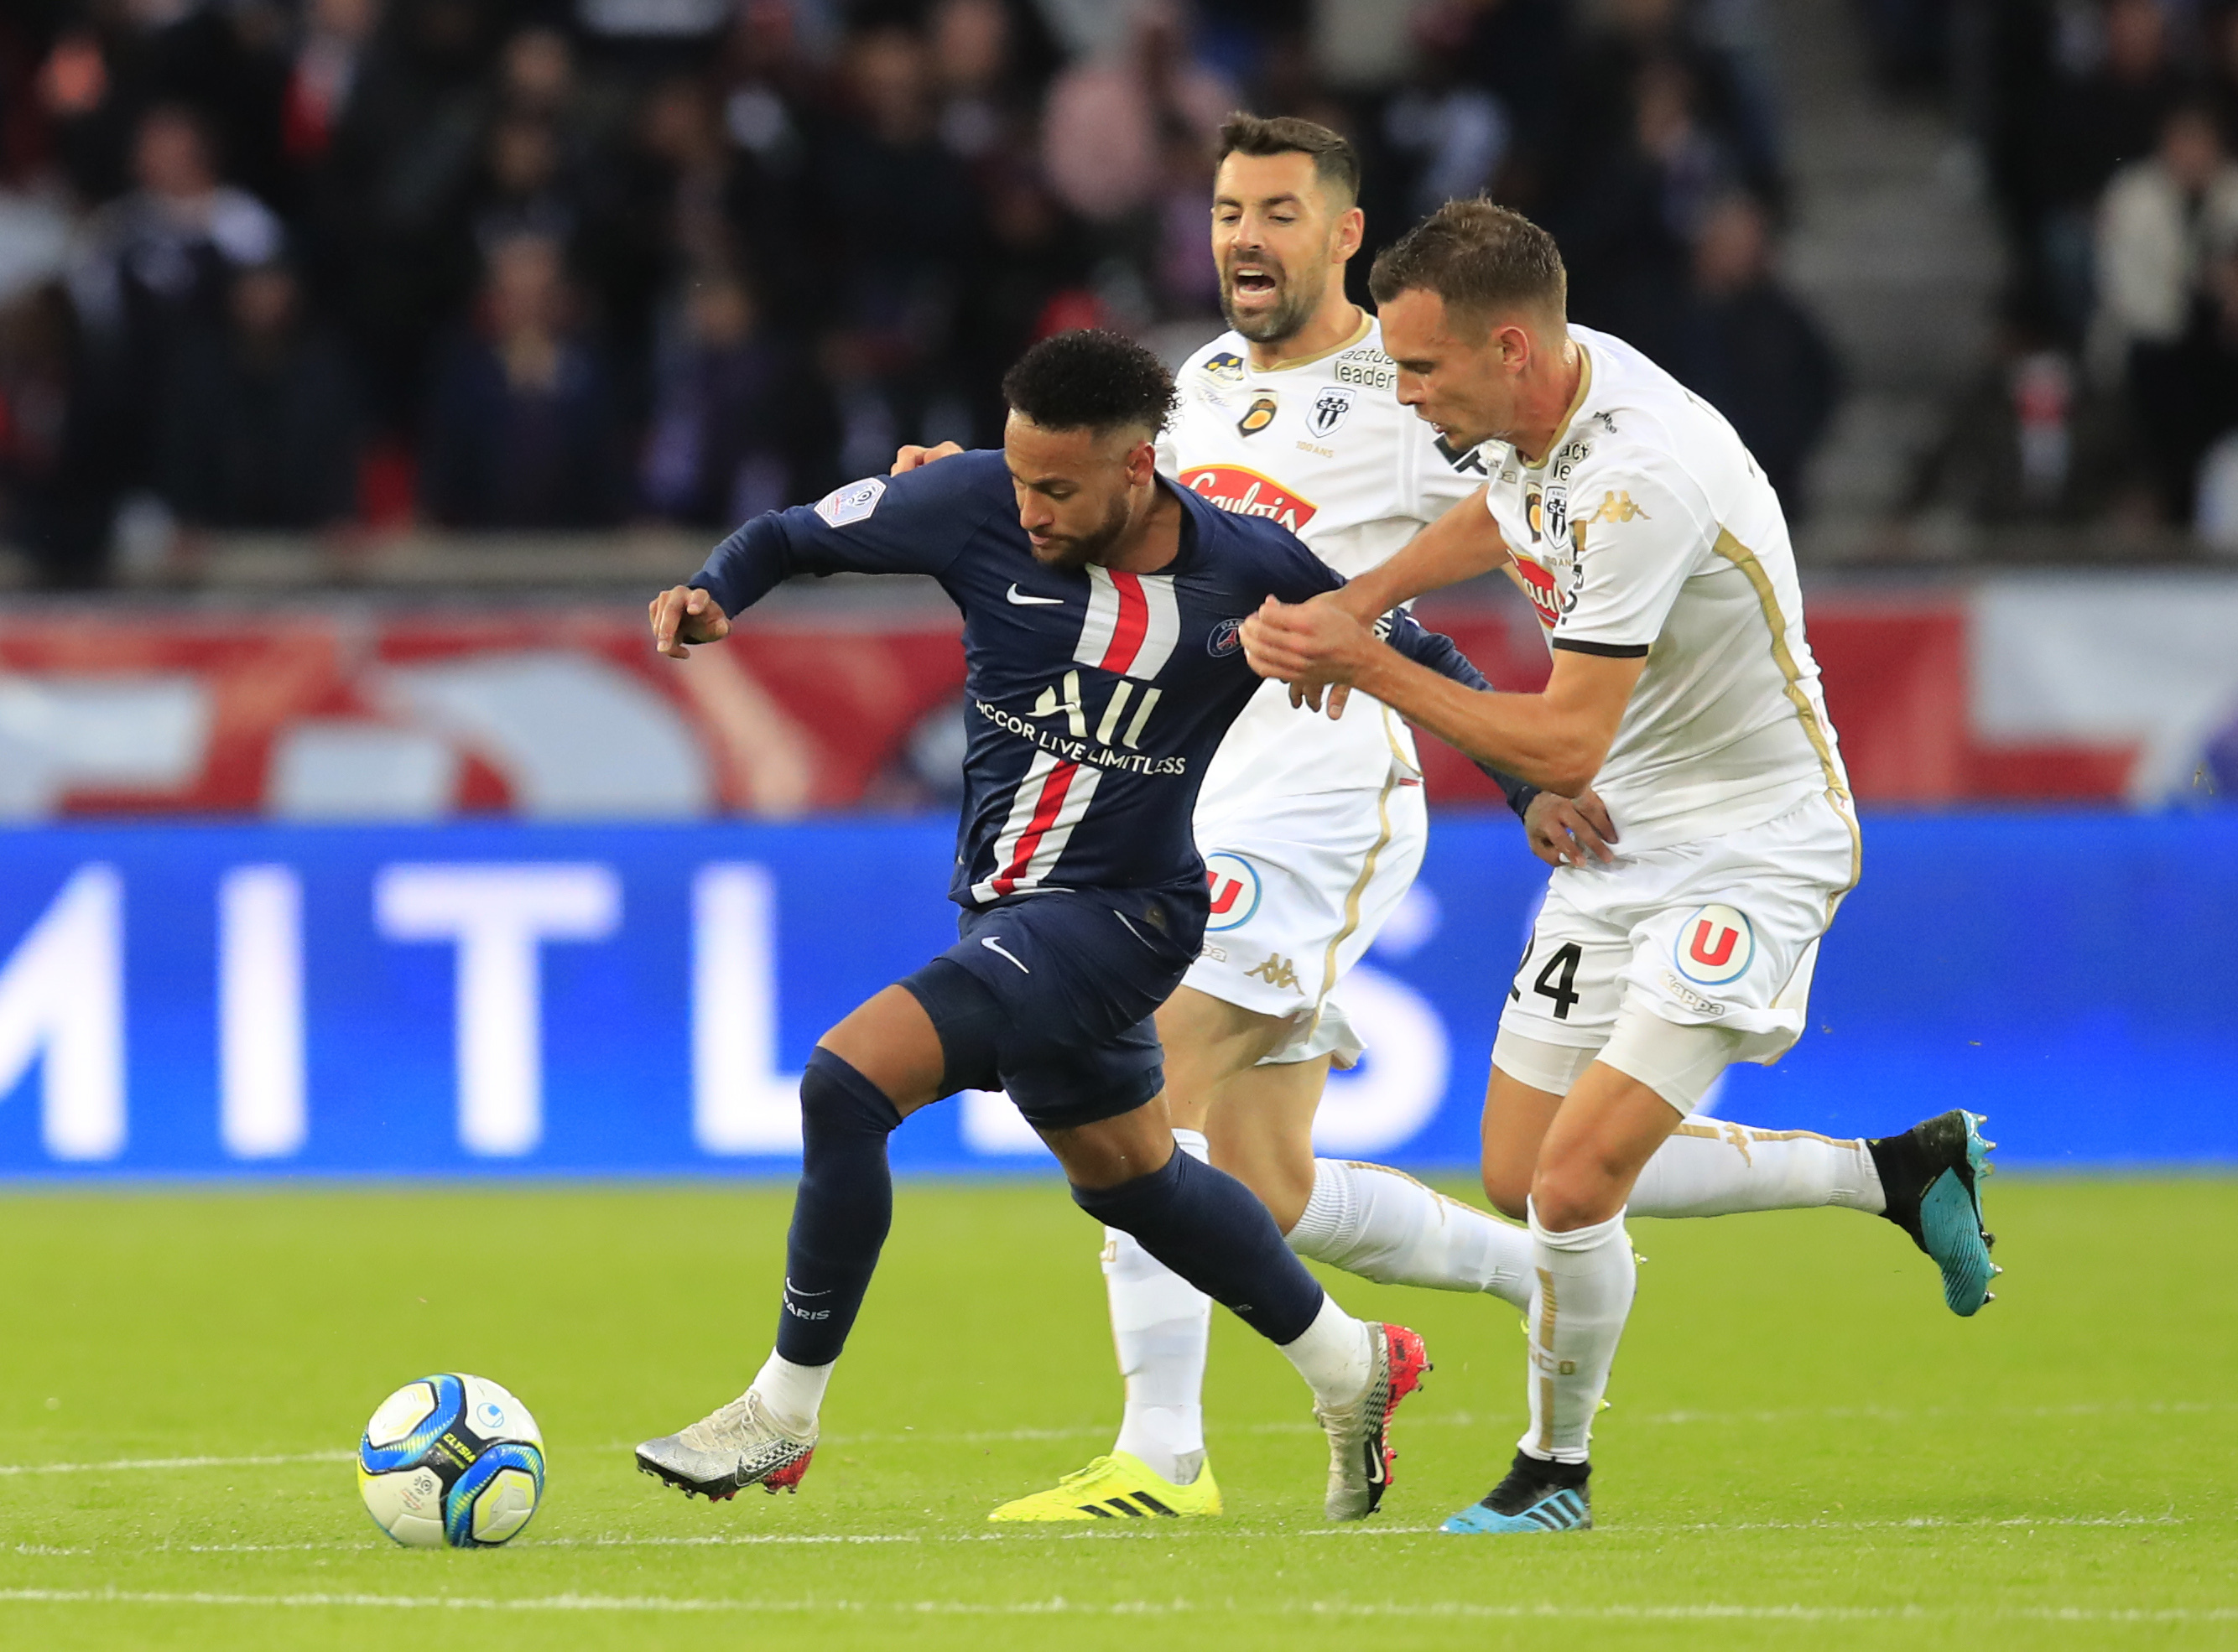 Sarabia stars for PSG in 4-0 win vs Angers, Neymar scores